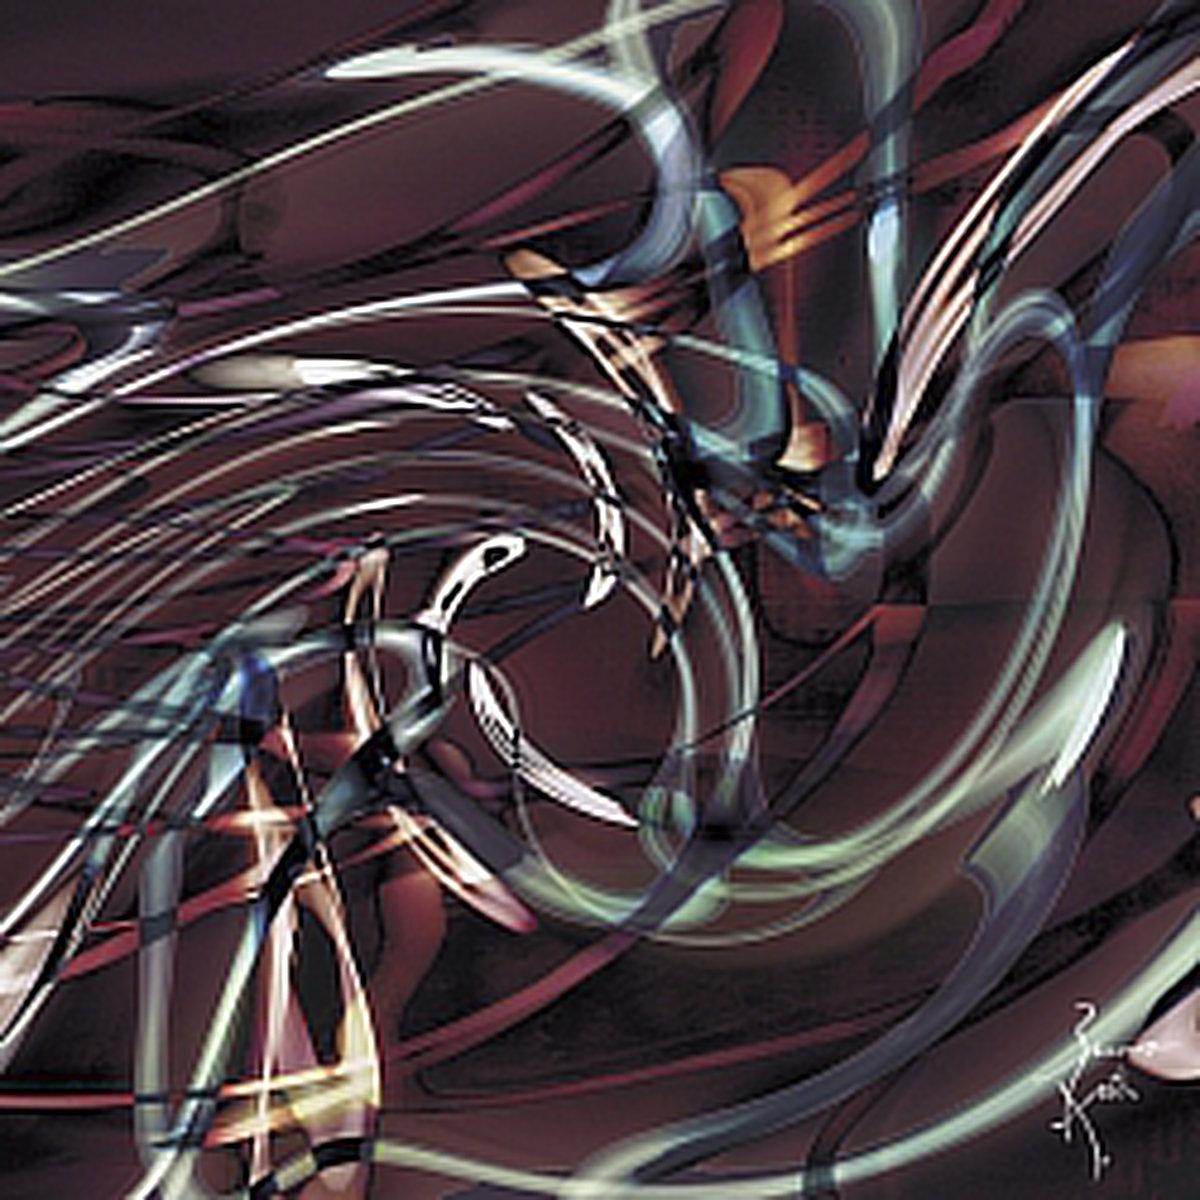 Peinture numérique Chromatoscopie. Série Chronoschromaties.